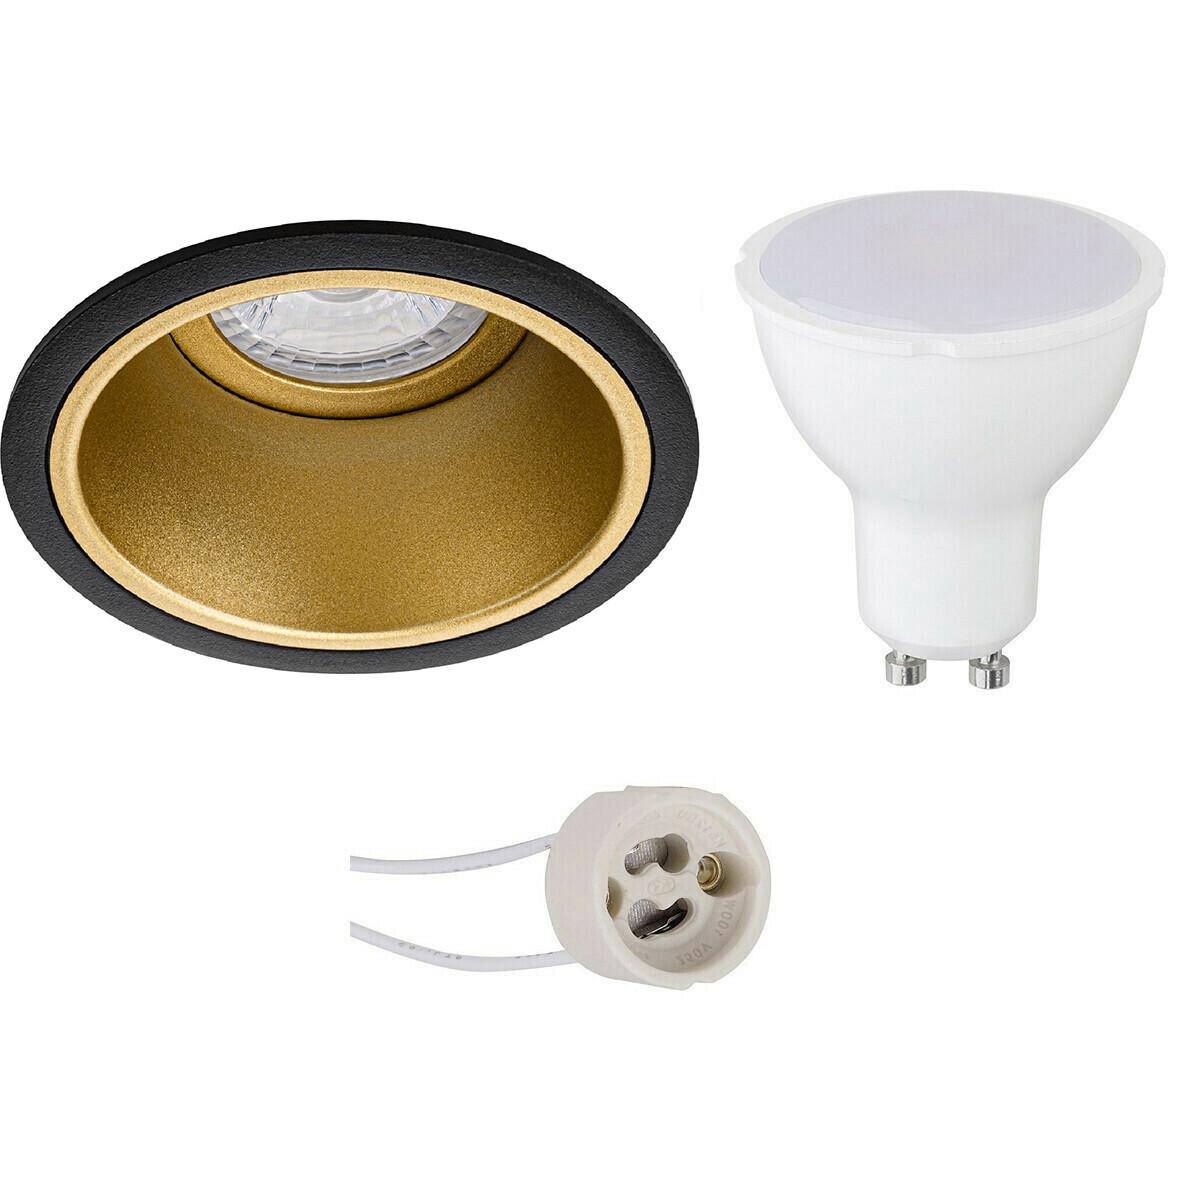 LED Spot Set - Aigi - Pragmi Minko Pro - GU10 Fitting - Inbouw Rond - Mat Zwart/Goud - 8W - Warm Wit